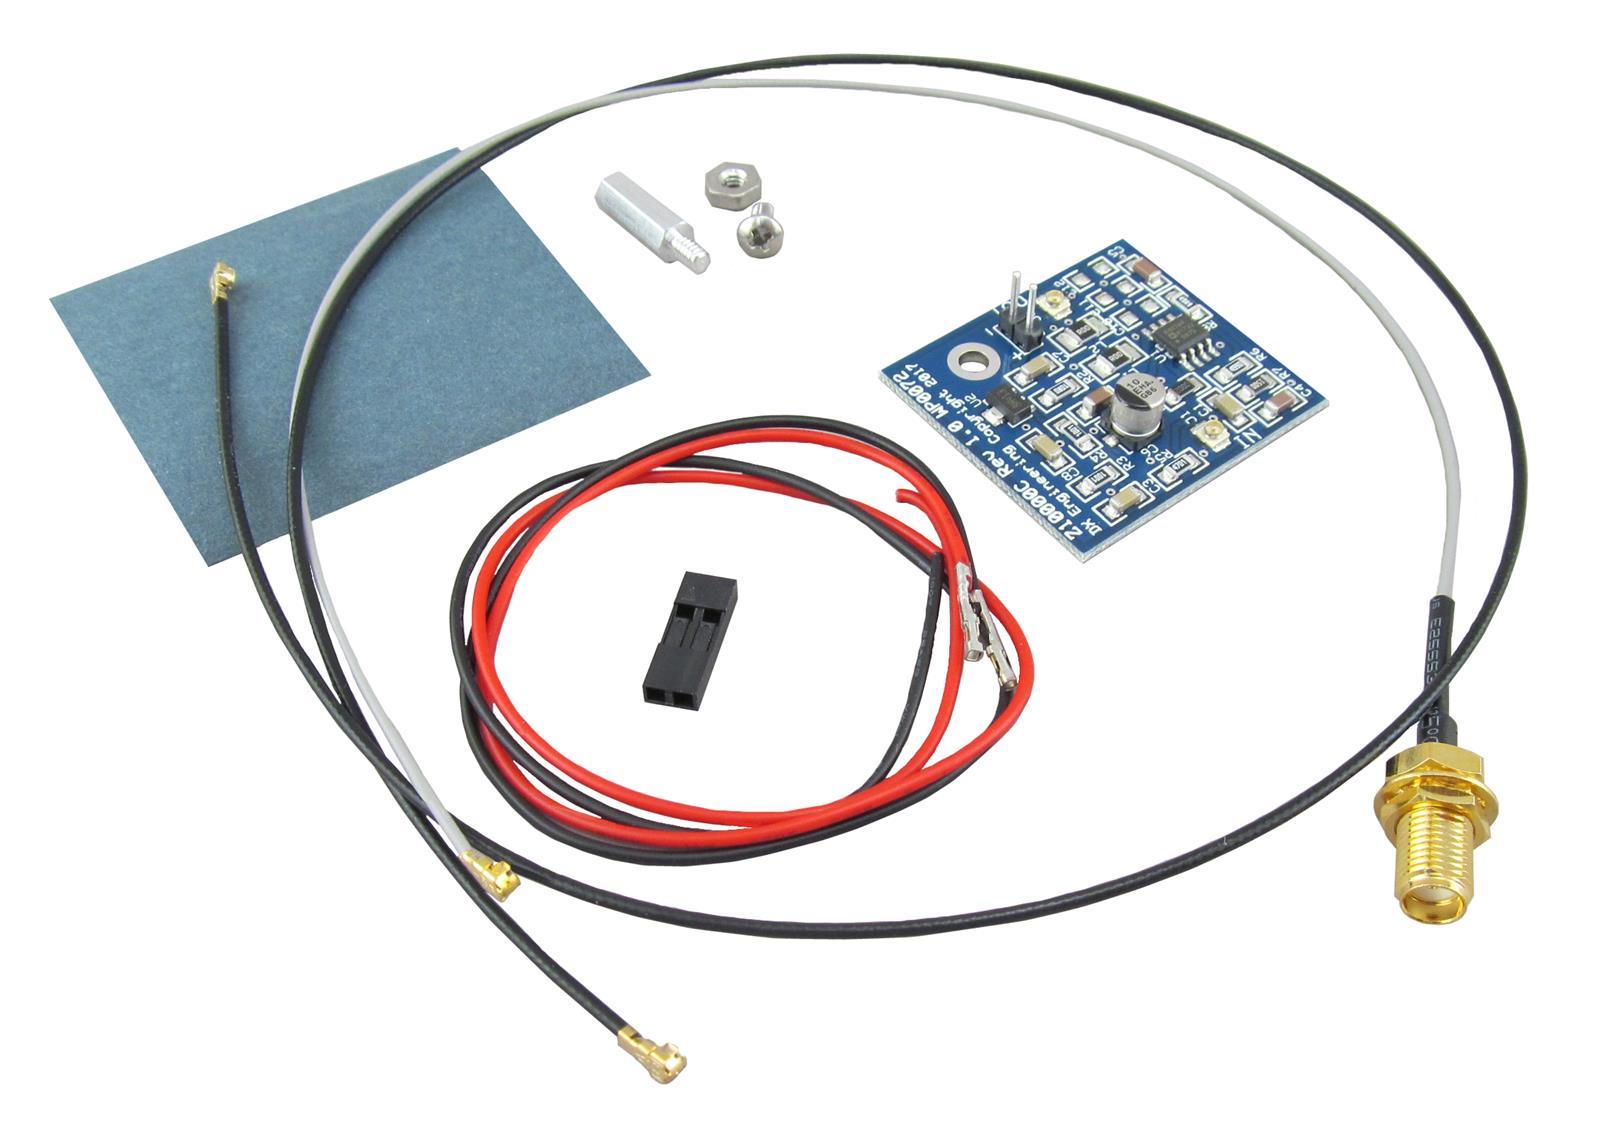 DX Engineering Clifton Laboratories Z10000 Buffer Amplifiers DXE-Z10000U-KIT